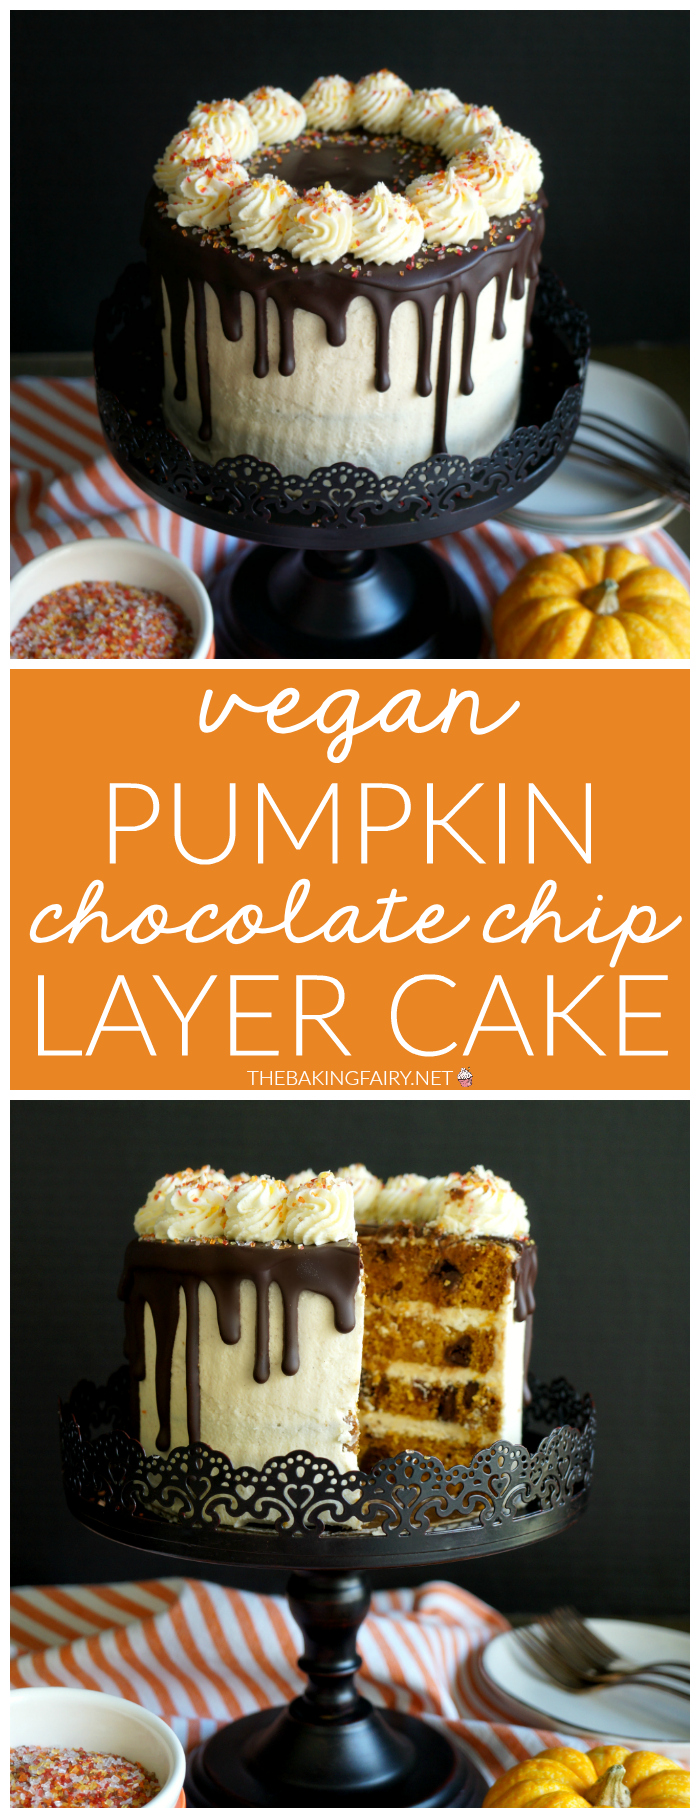 vegan pumpkin chocolate chip layer cake | The Baking Fairy #PumpkinWeek #ad